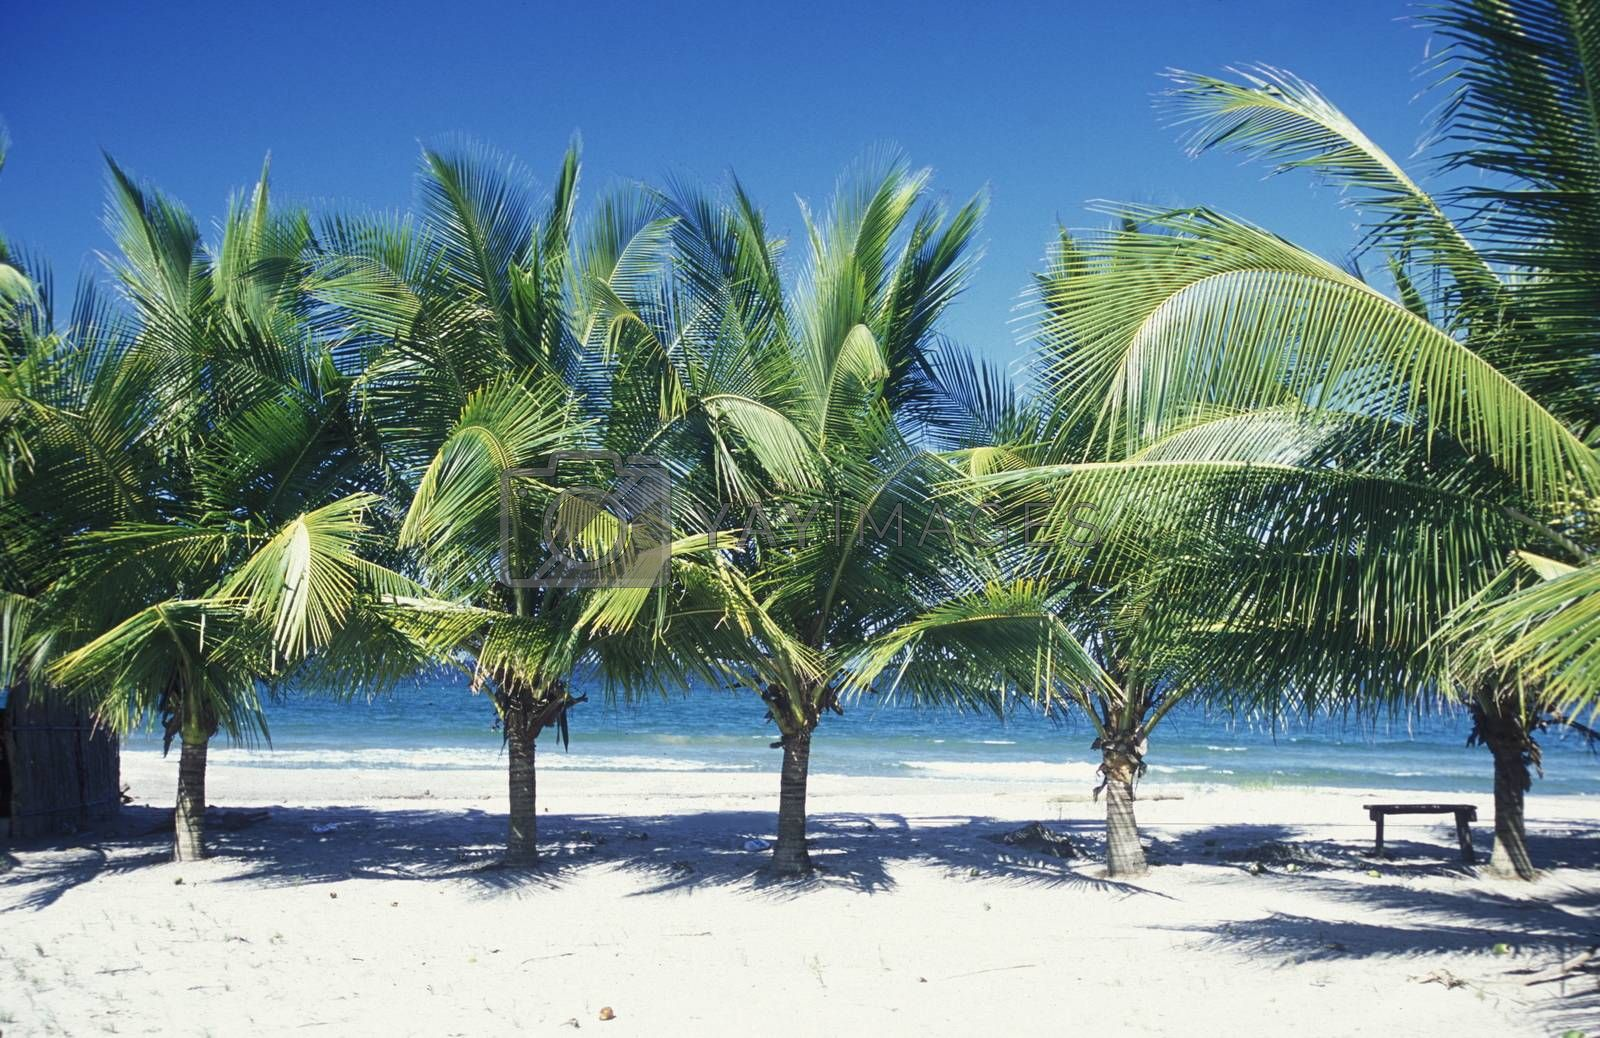 Royalty free image of LATIN AMERICA HONDURAS CARIBIAN SEA by urf